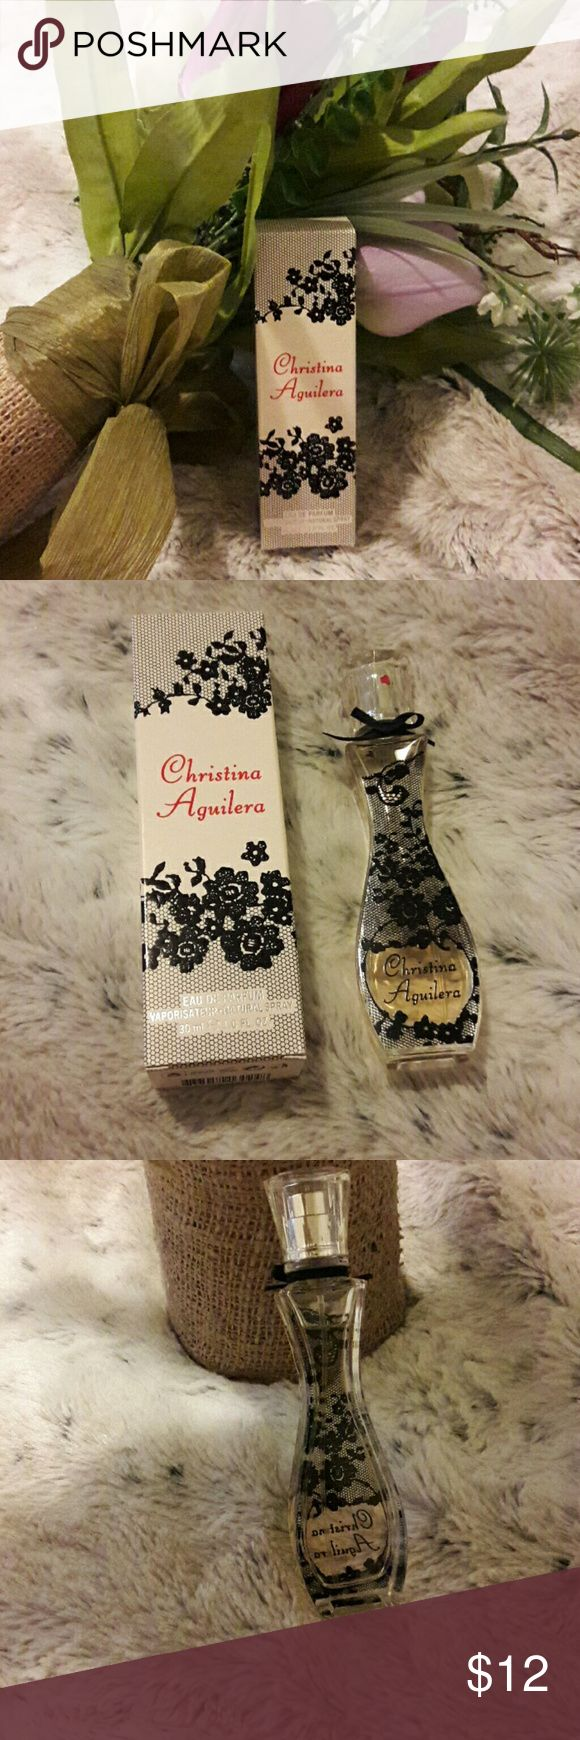 New Christina Aguilera Perfume New Christina Aguilera Perfume. 1.0 FL. OZ. Christina Aguilera  Other